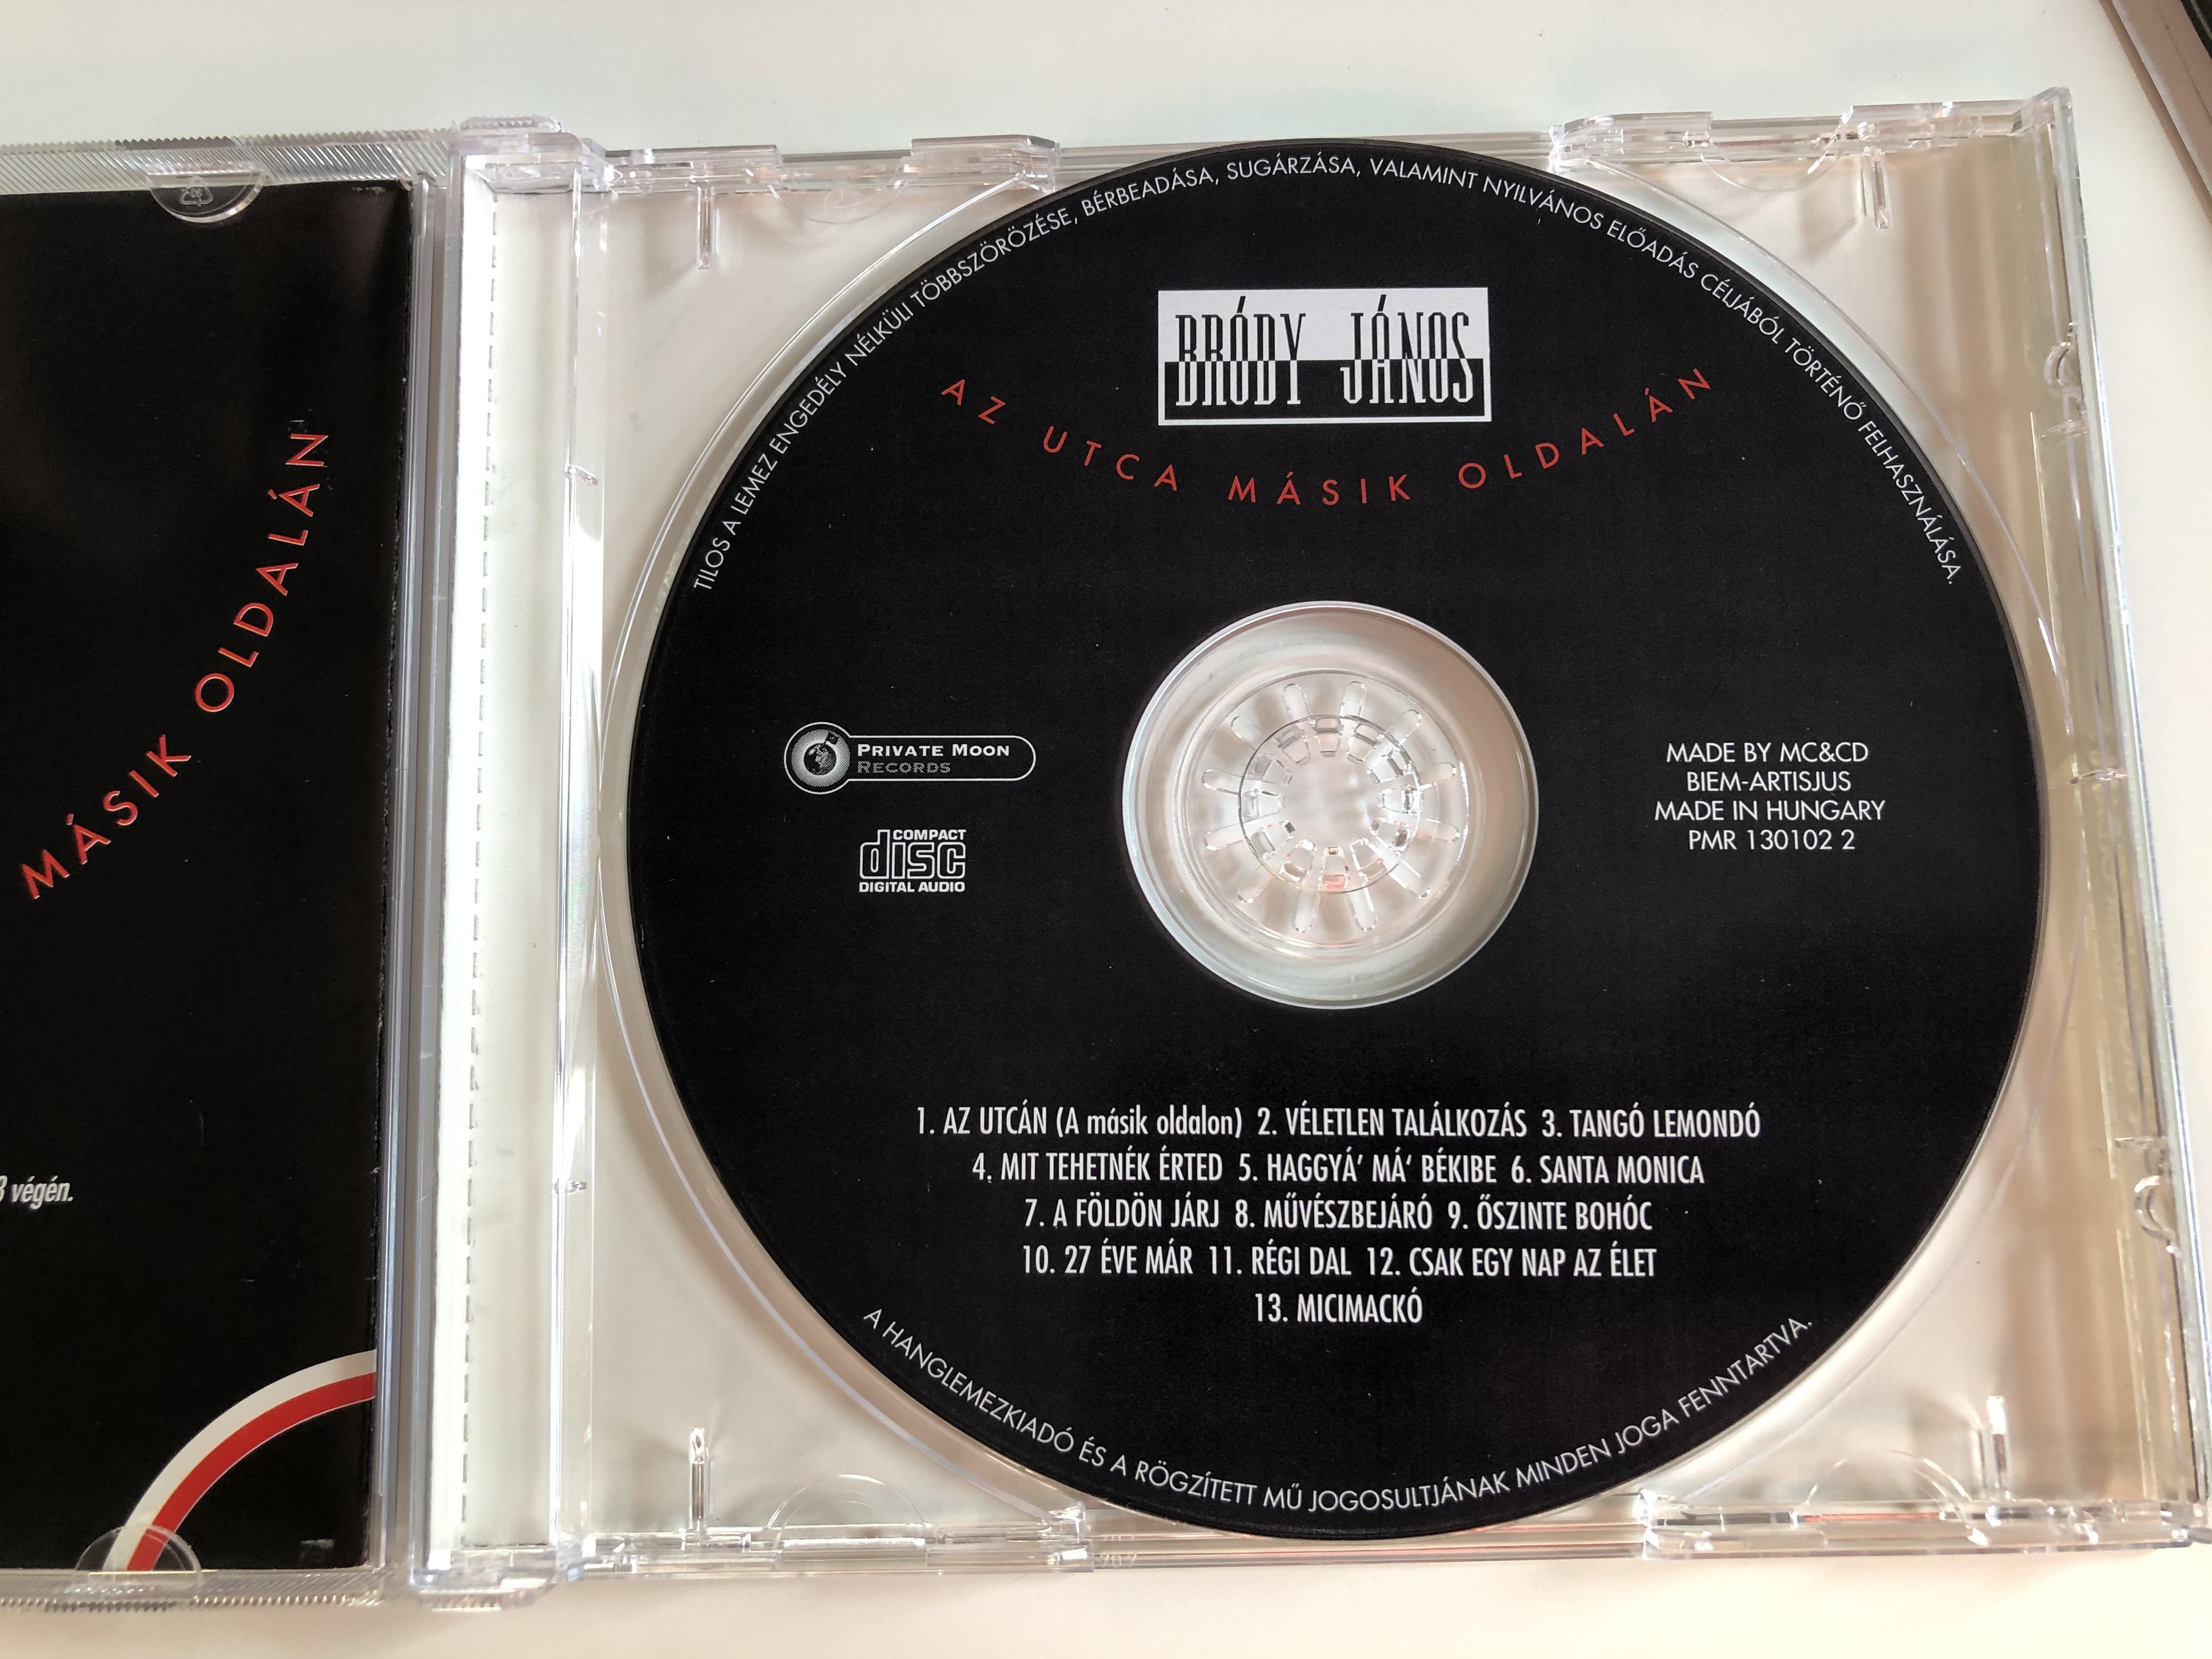 br-dy-j-nos-az-utca-m-sik-oldal-n-private-moon-records-audio-cd-2001-pmr-130102-2-4-.jpg